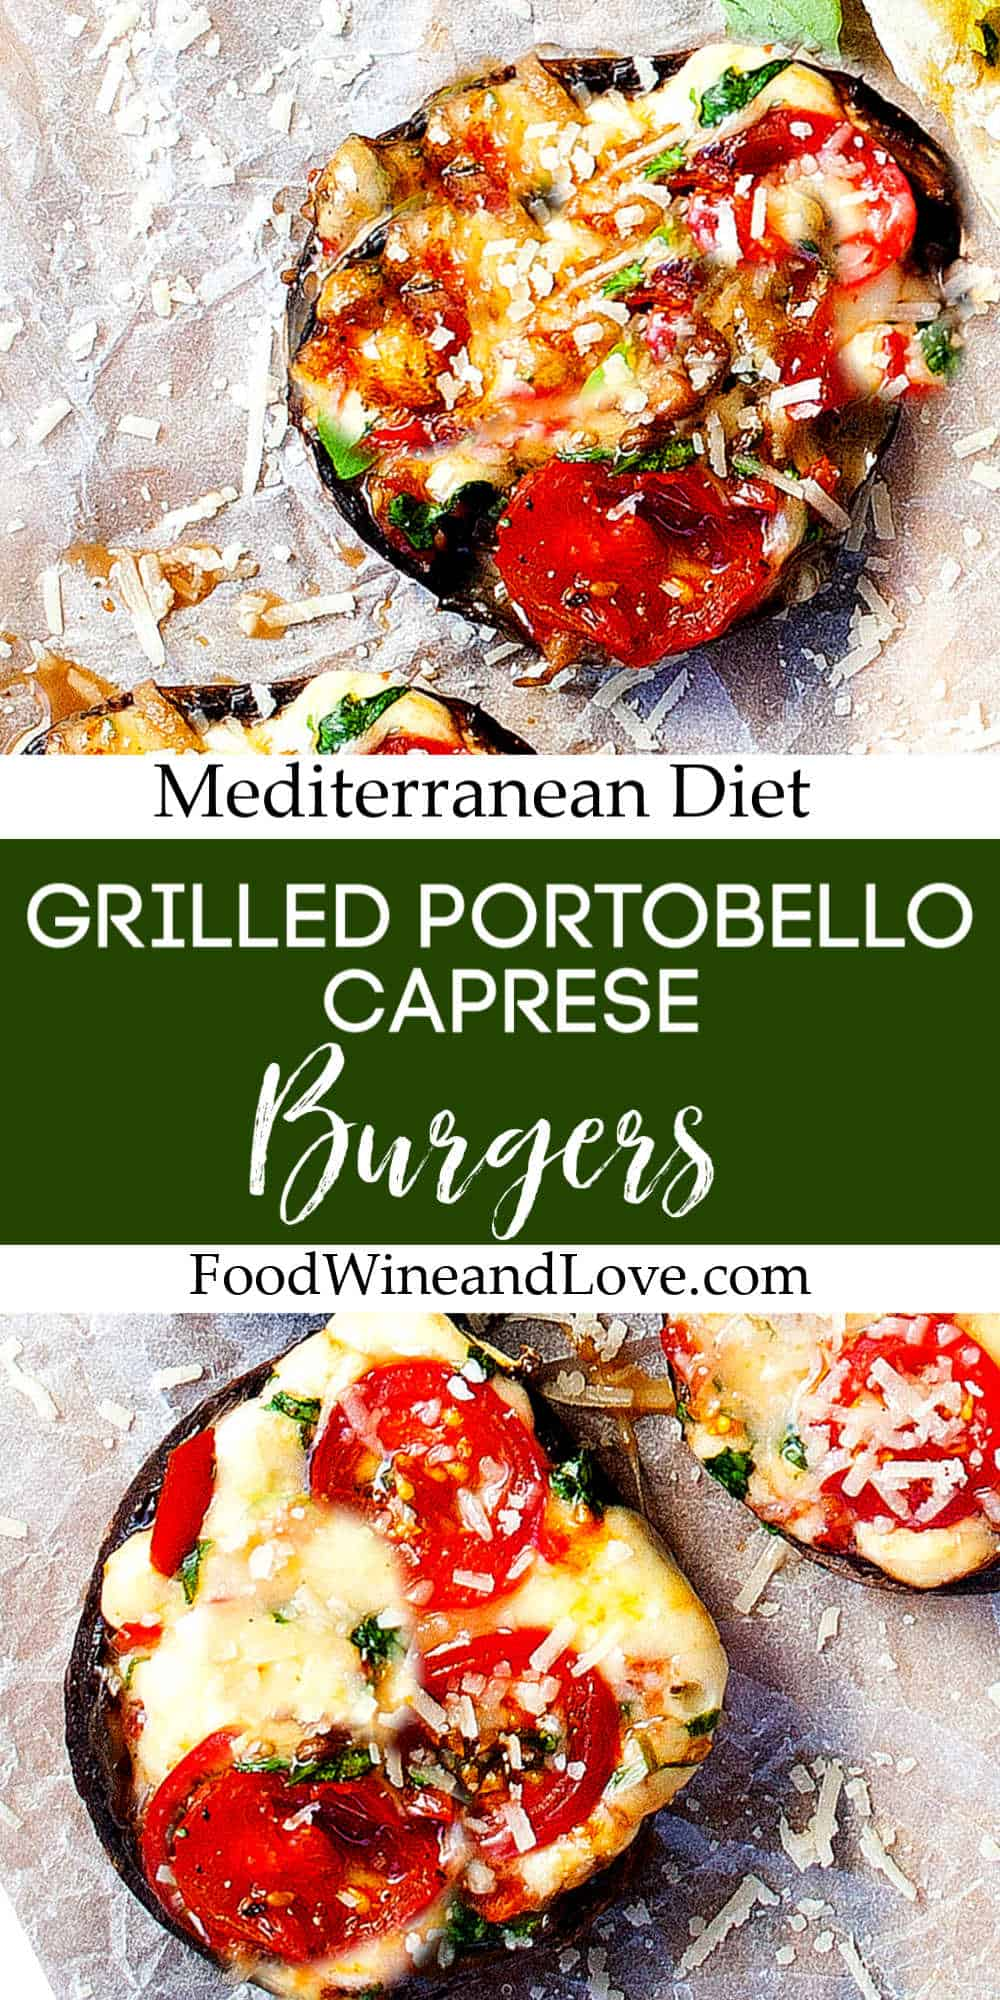 Grilled Portobello Caprese Burgers